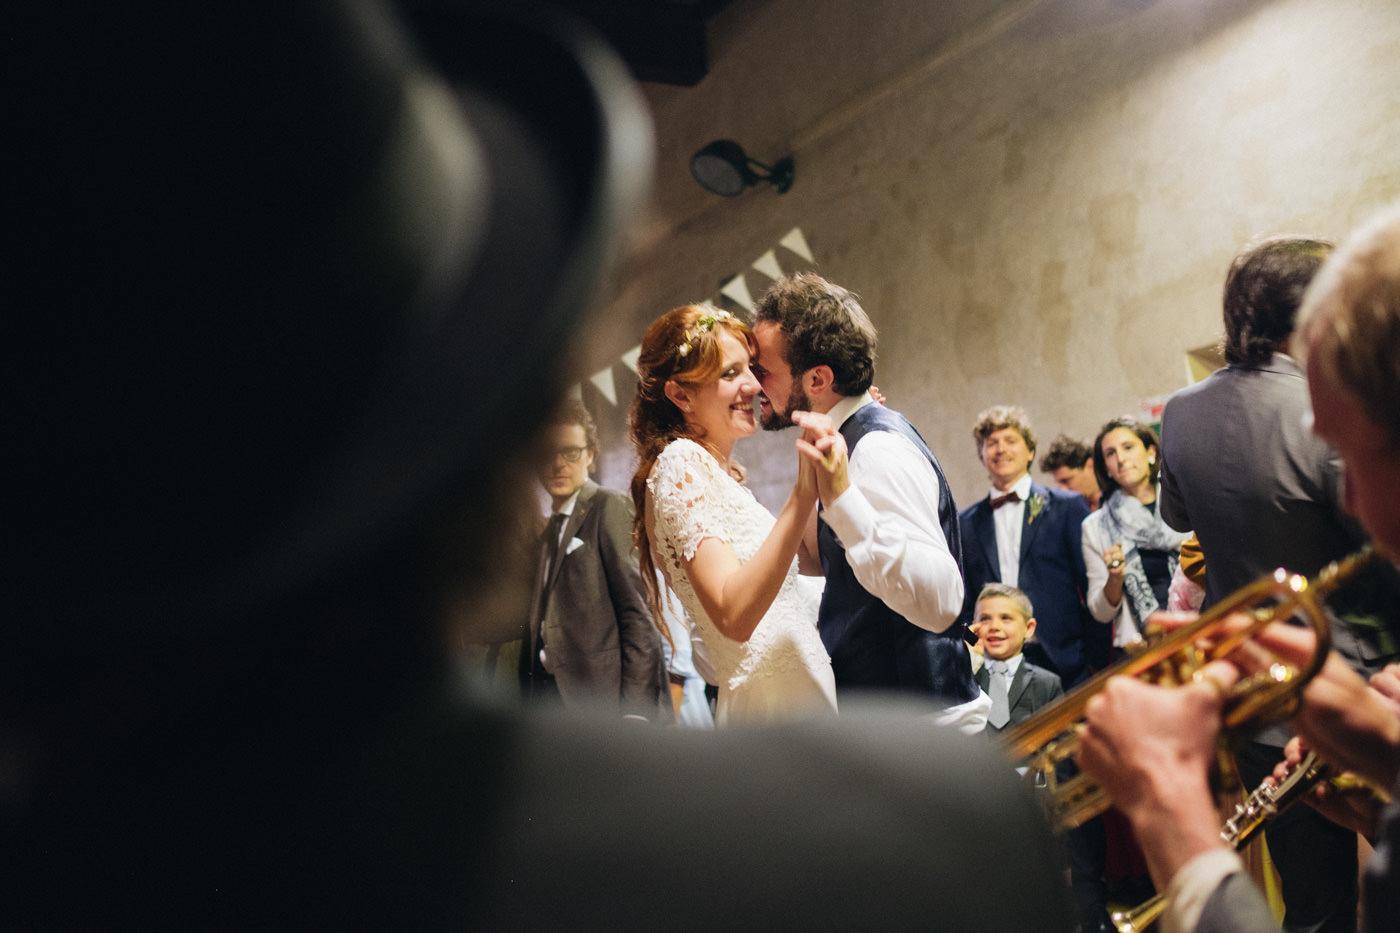 matrimoni_all_italiana_fotografo_matrimonio_toscana-77.jpg